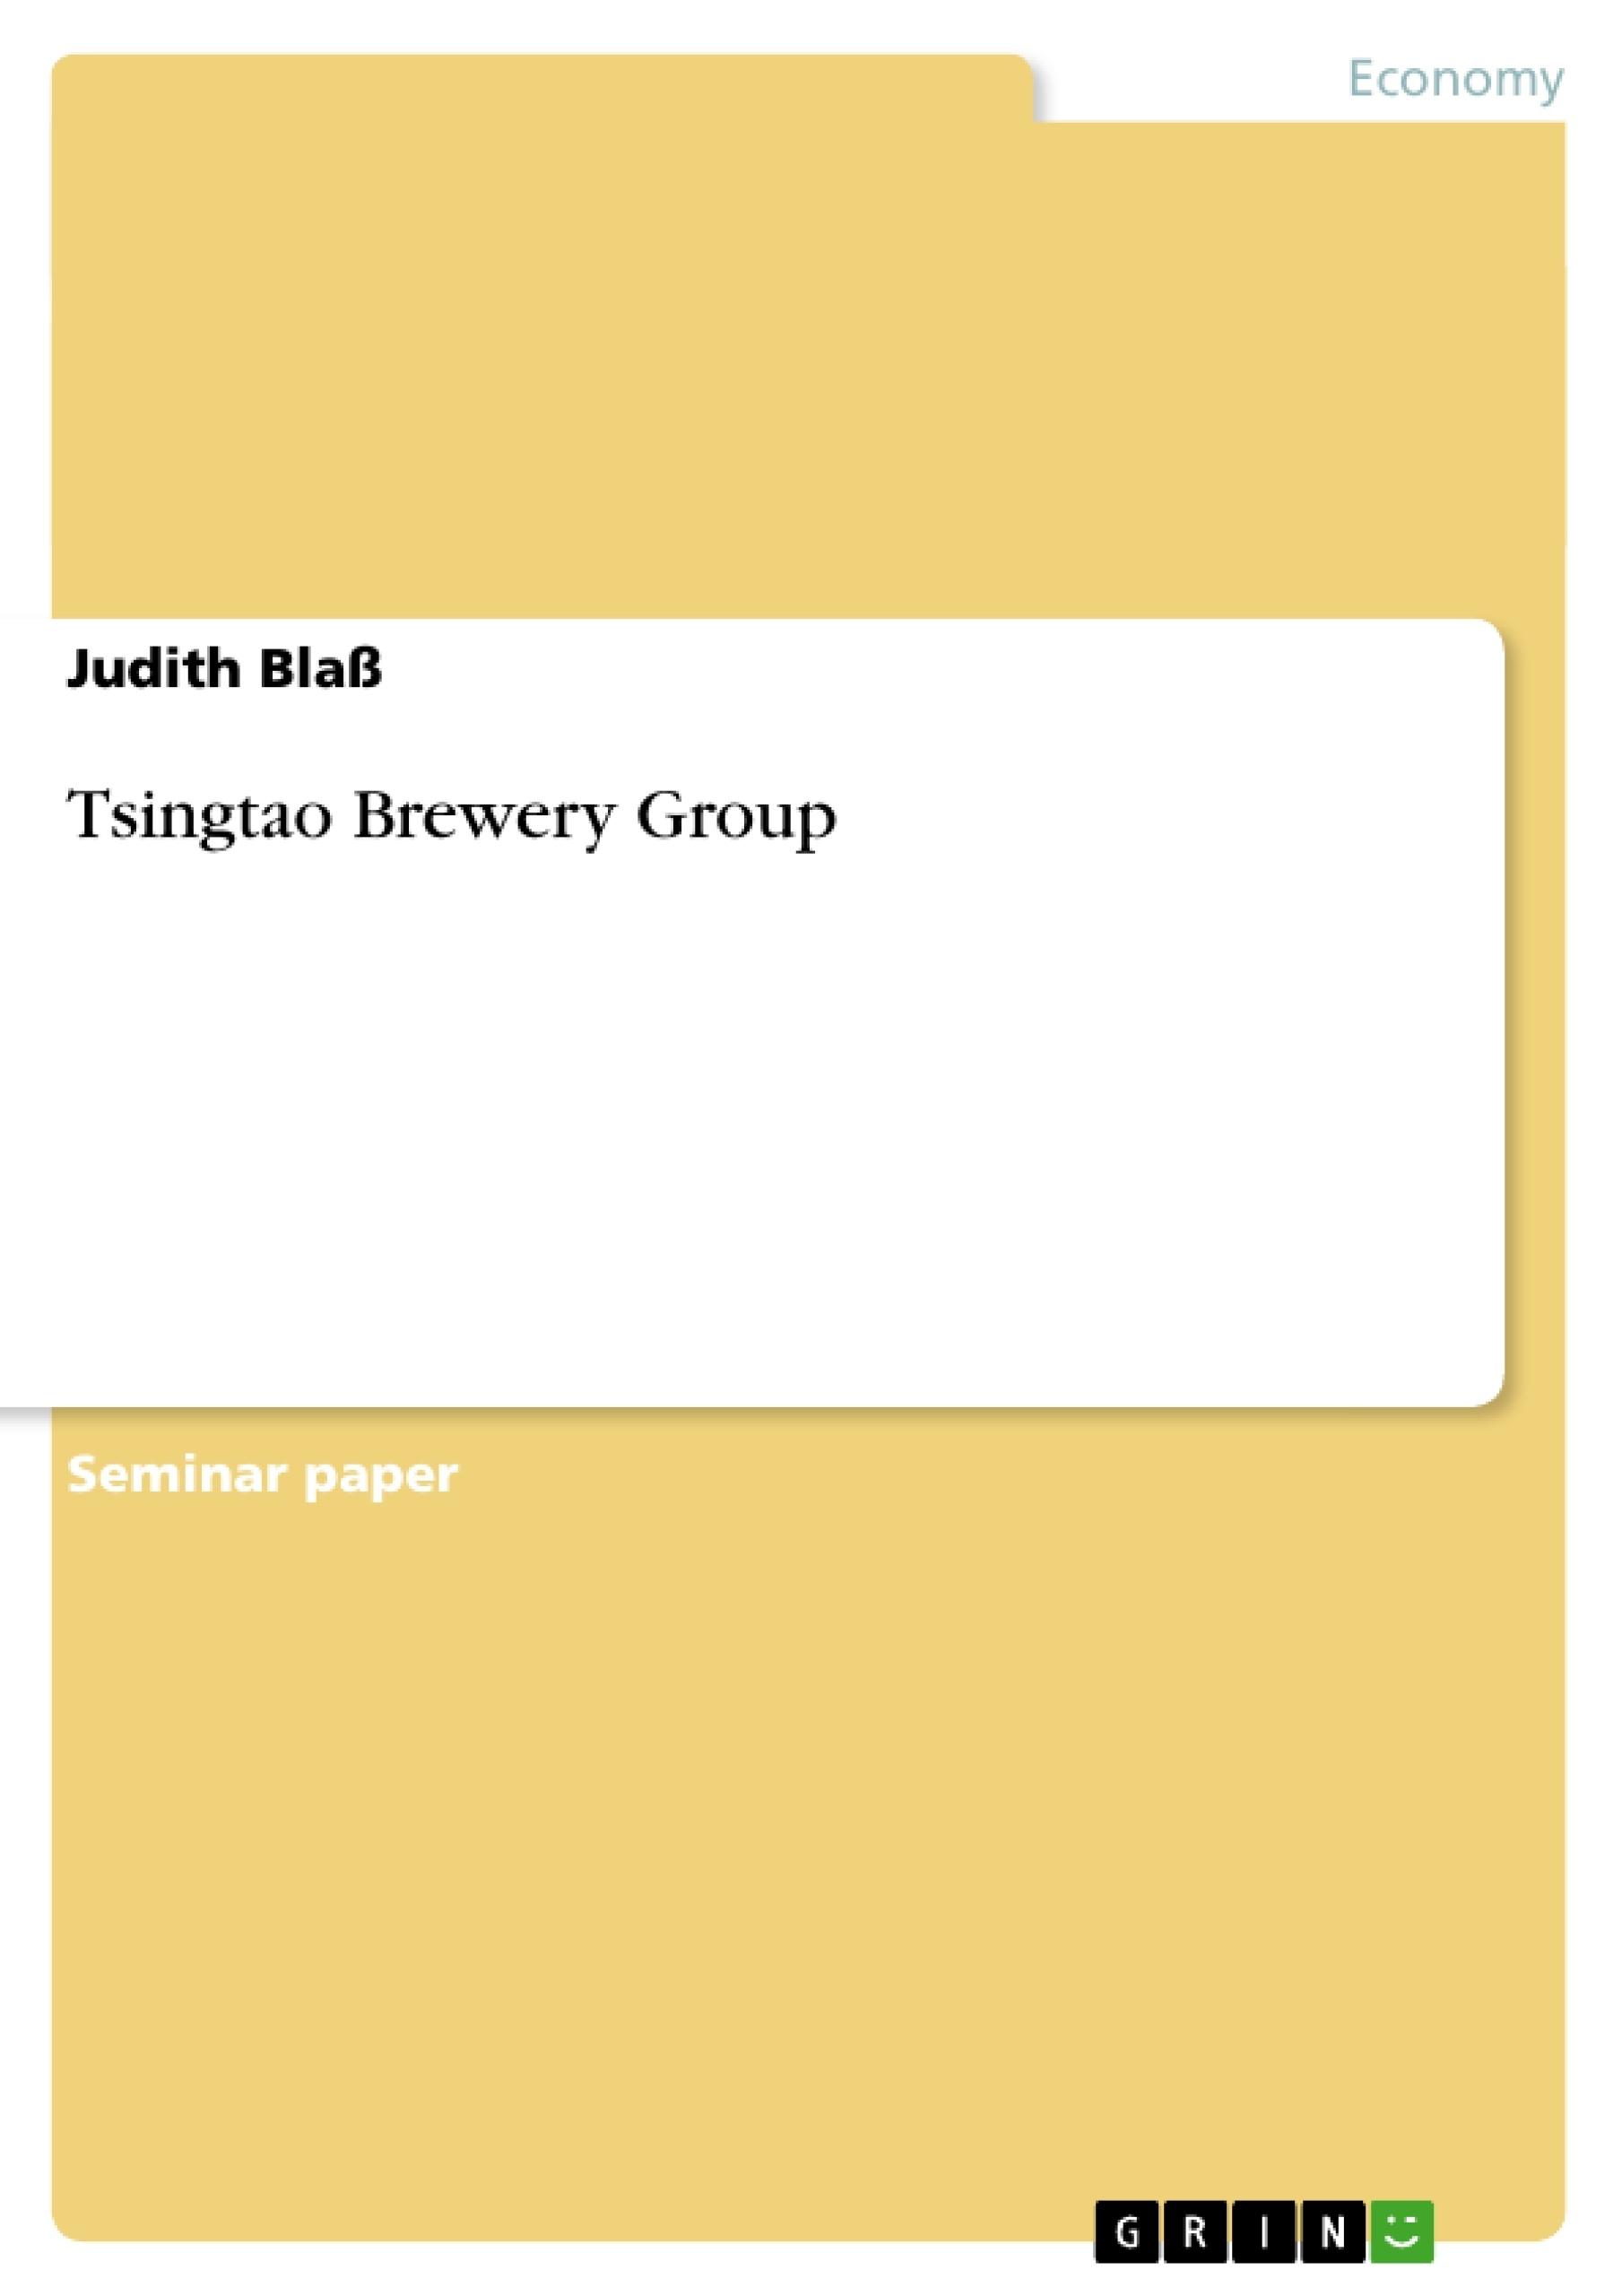 Title: Tsingtao Brewery Group